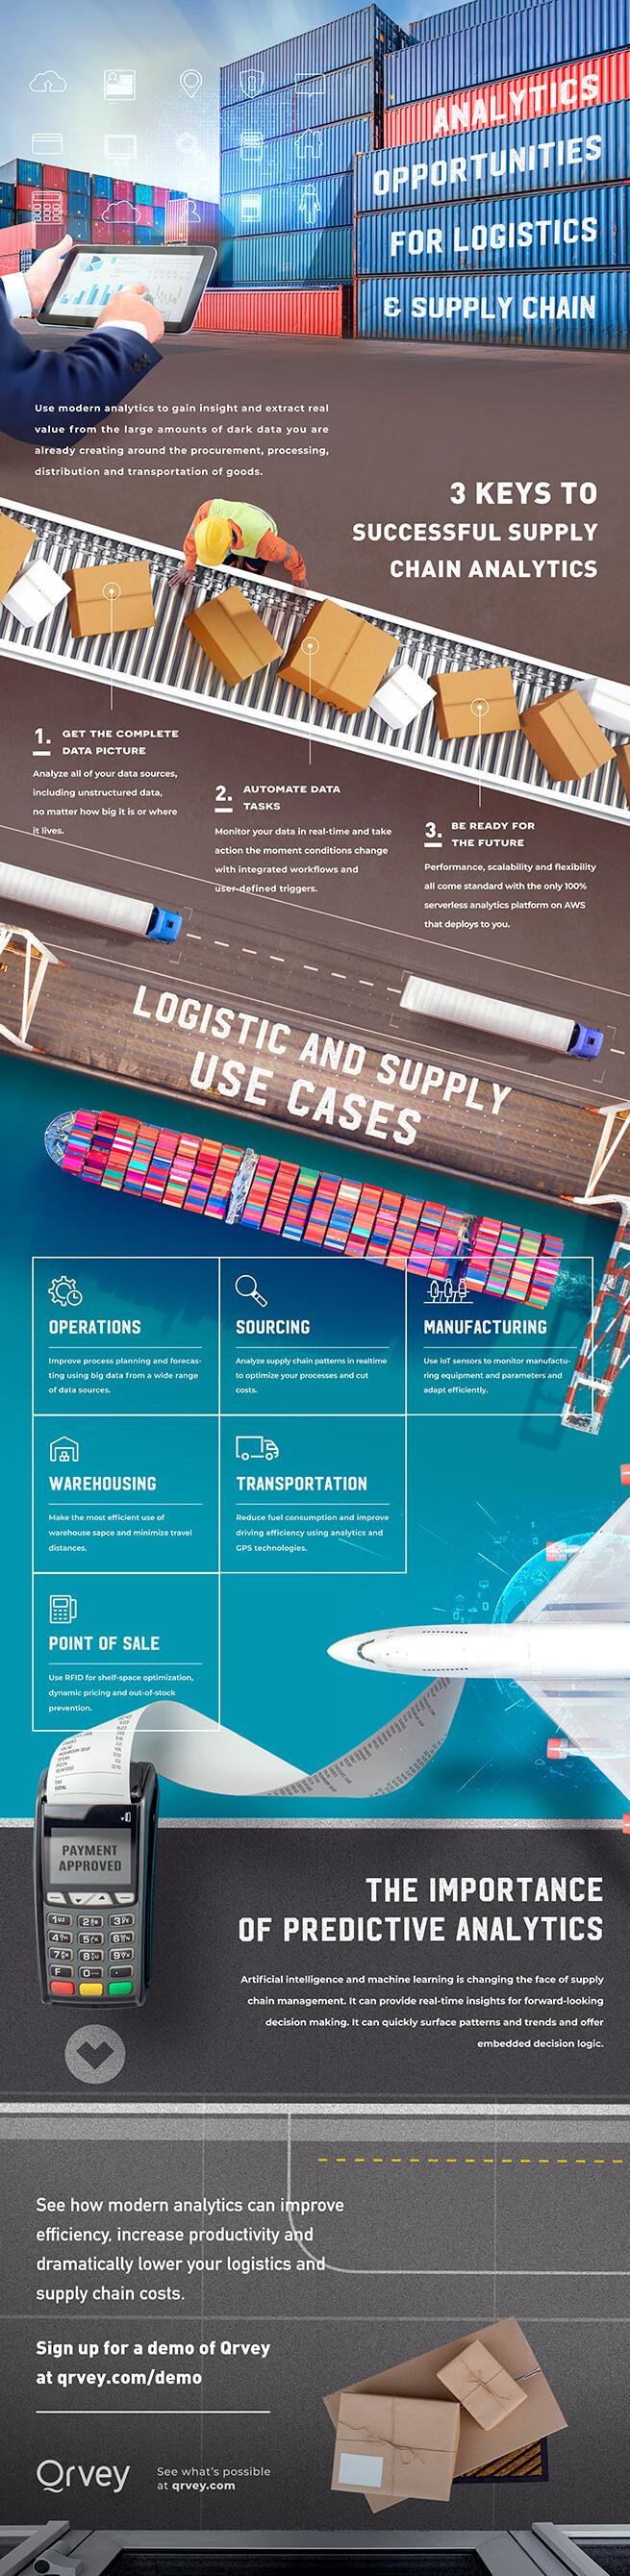 Infographic: Logistics and Supply Chain Analytics